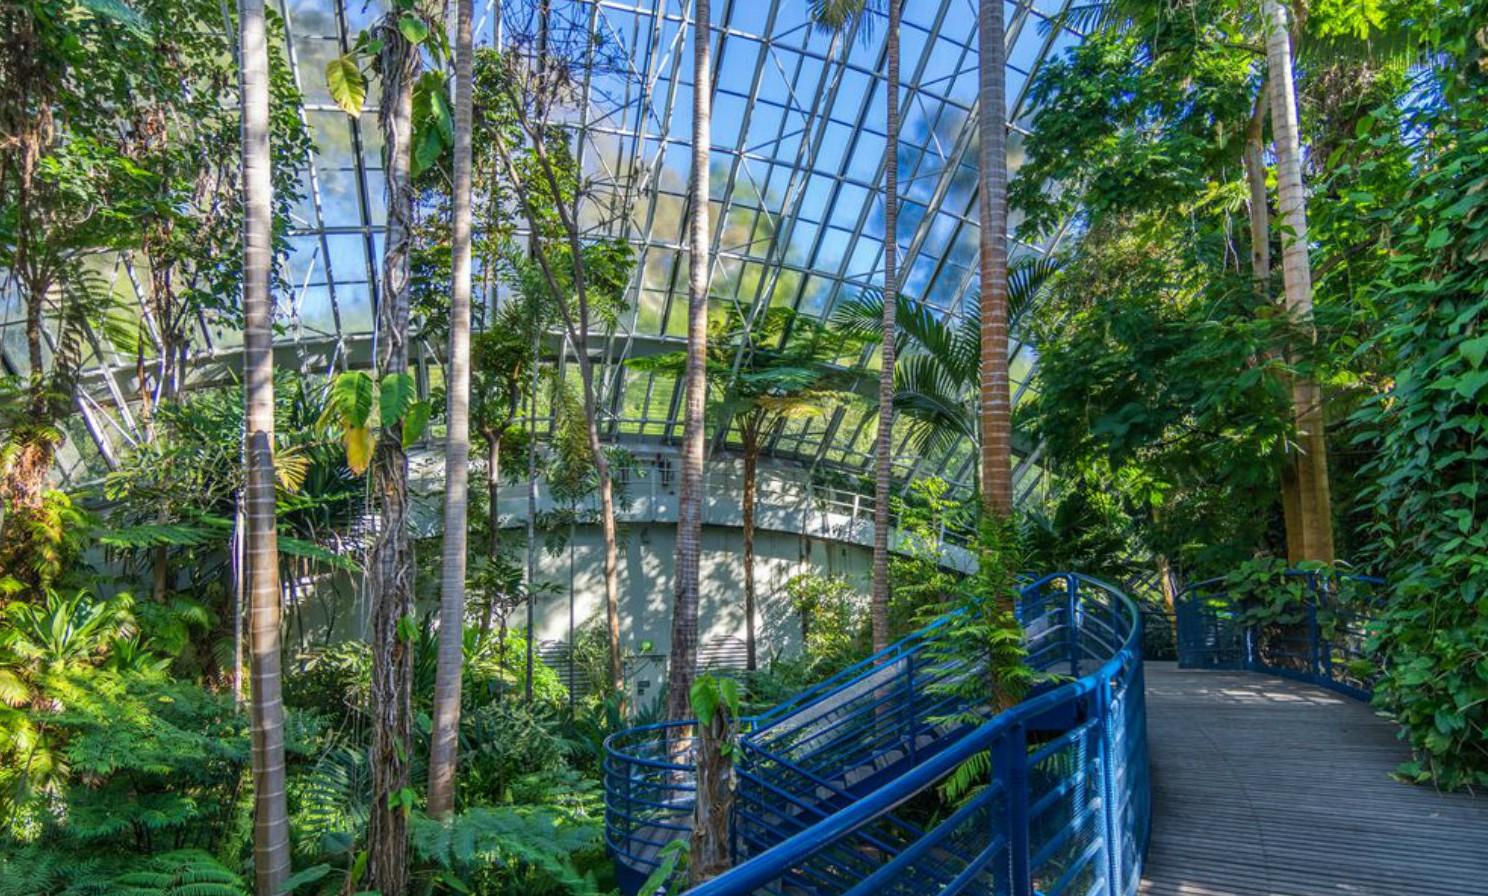 De 10 mooiste greenhouses ter wereld - Bicentennial Conservatory in Adelaide Australie